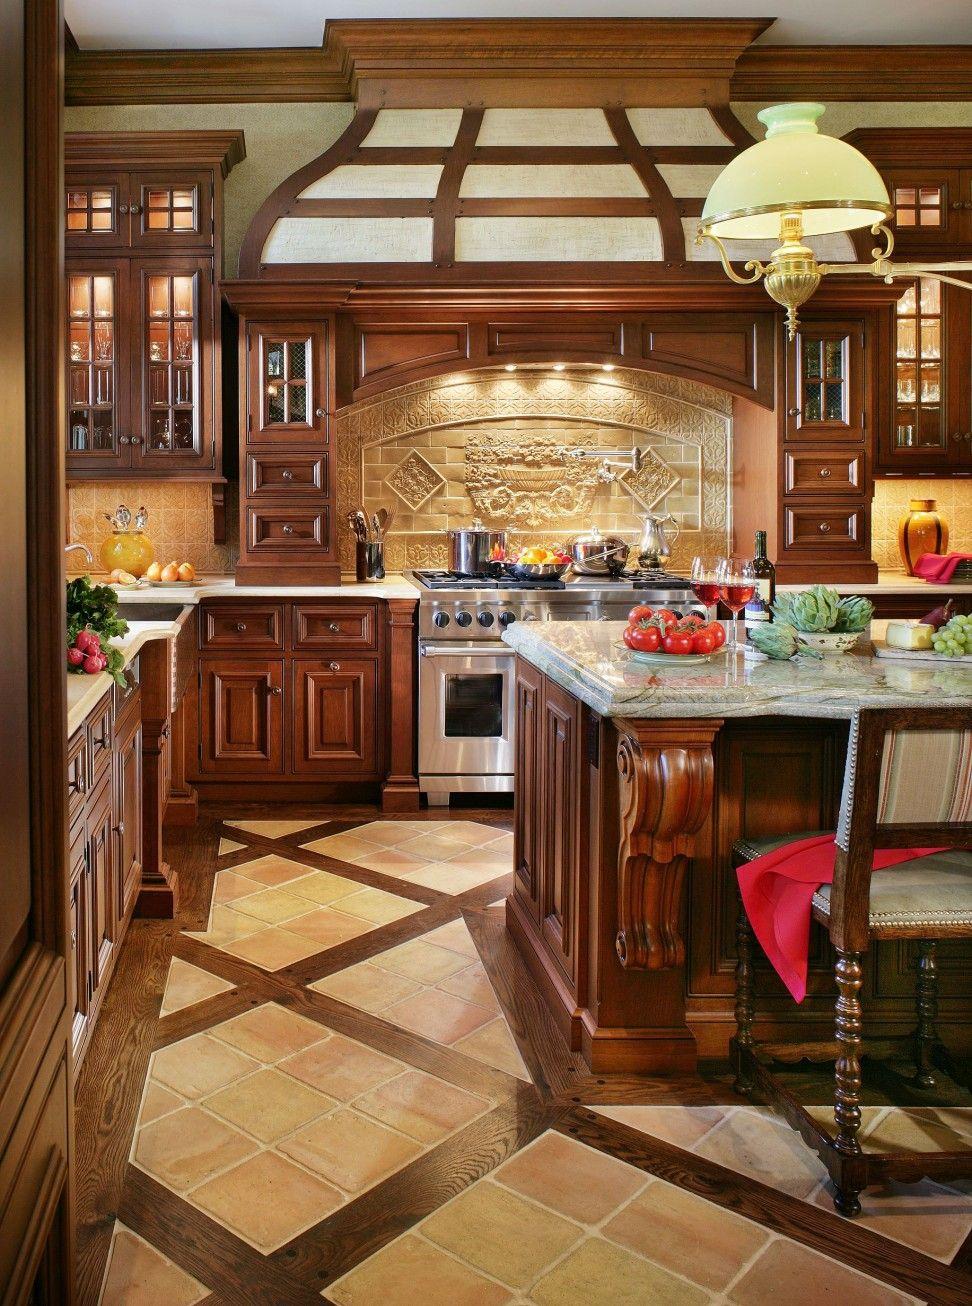 Kitchen Ravishing Black Iron Chandellier Traditional Kitchen Unique Outside Kitchens Designs Design Ideas